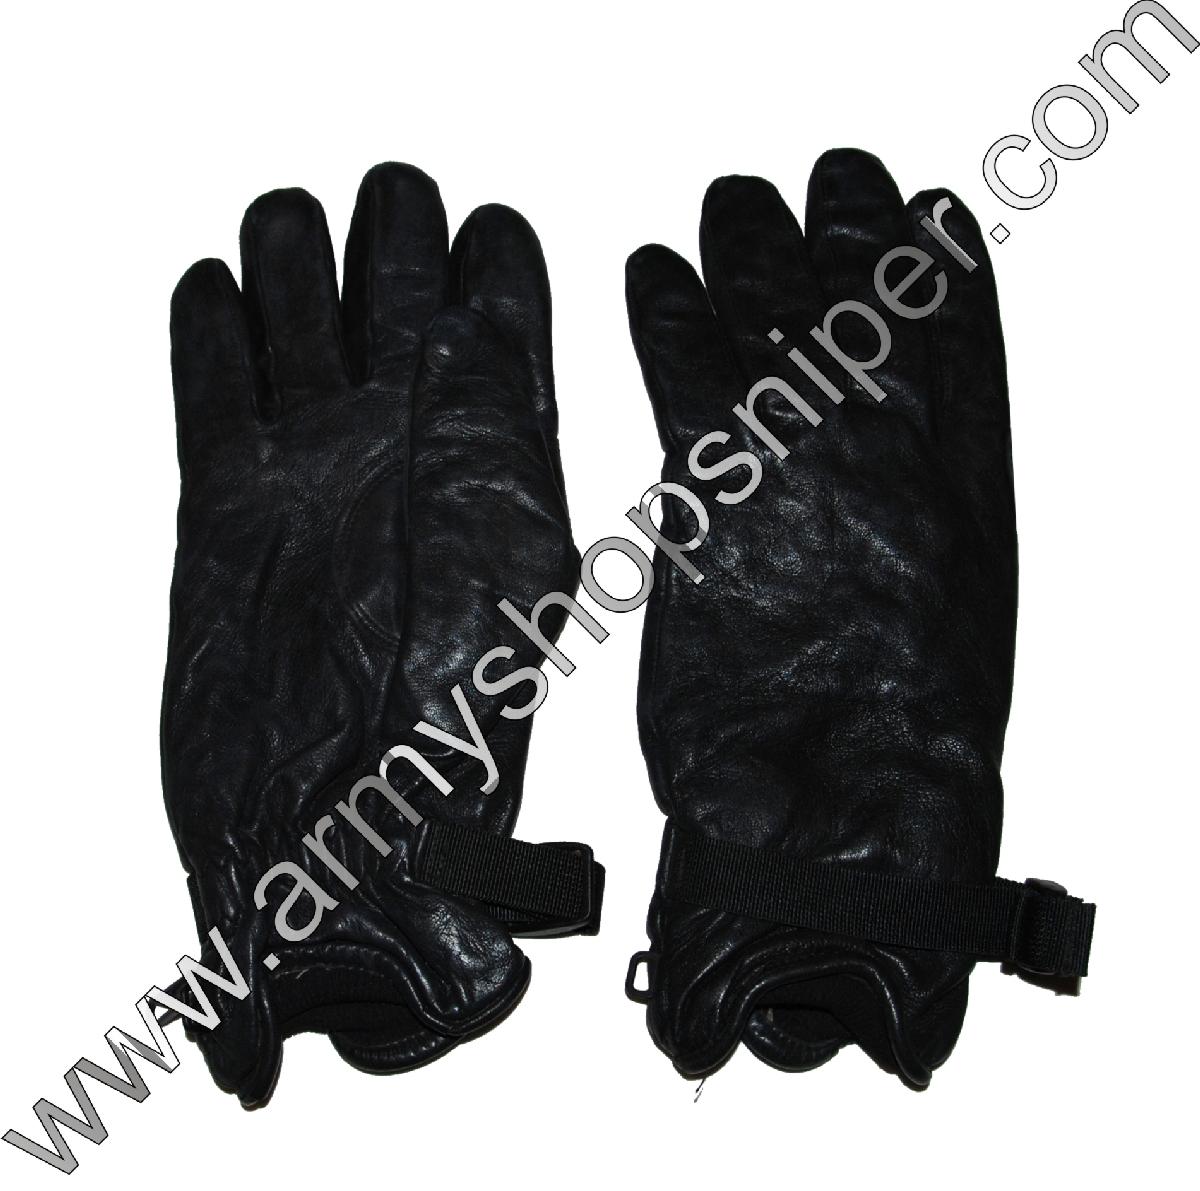 Rukavice kožené černé